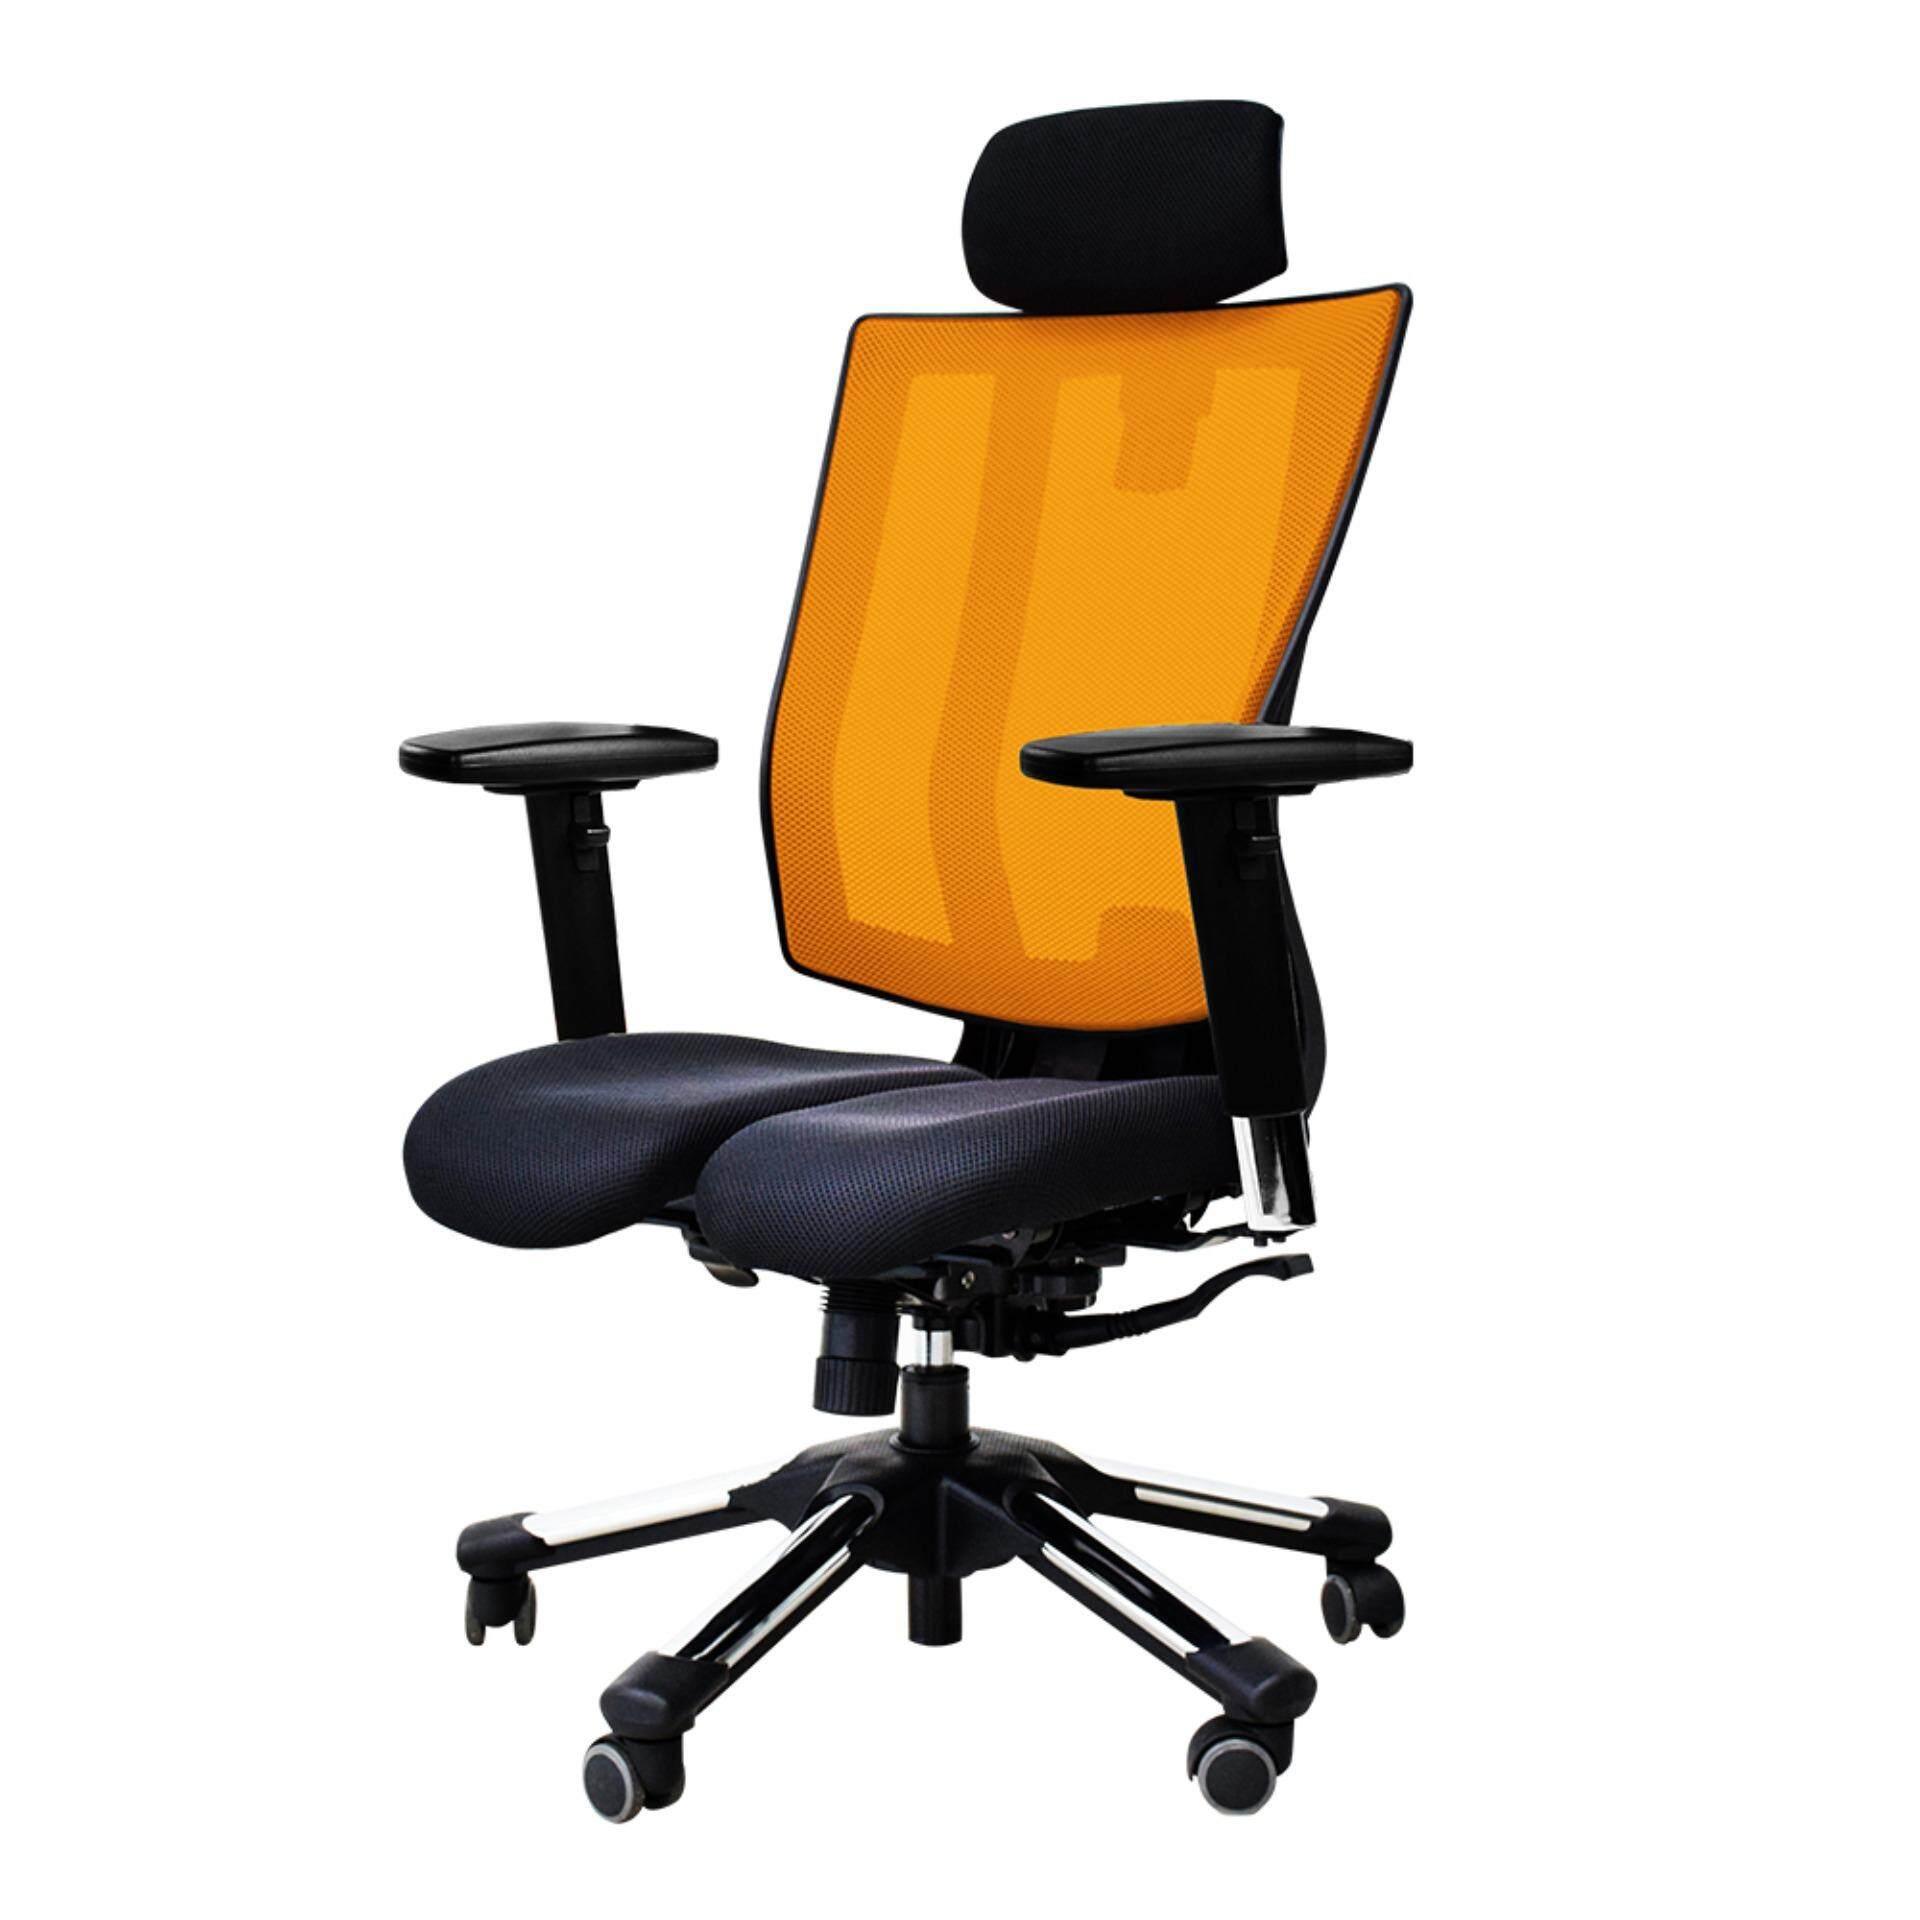 Hara Chair เก้าอี้สํานักงานเพื่อสุขภาพ Uruus 2 (สีส้ม).